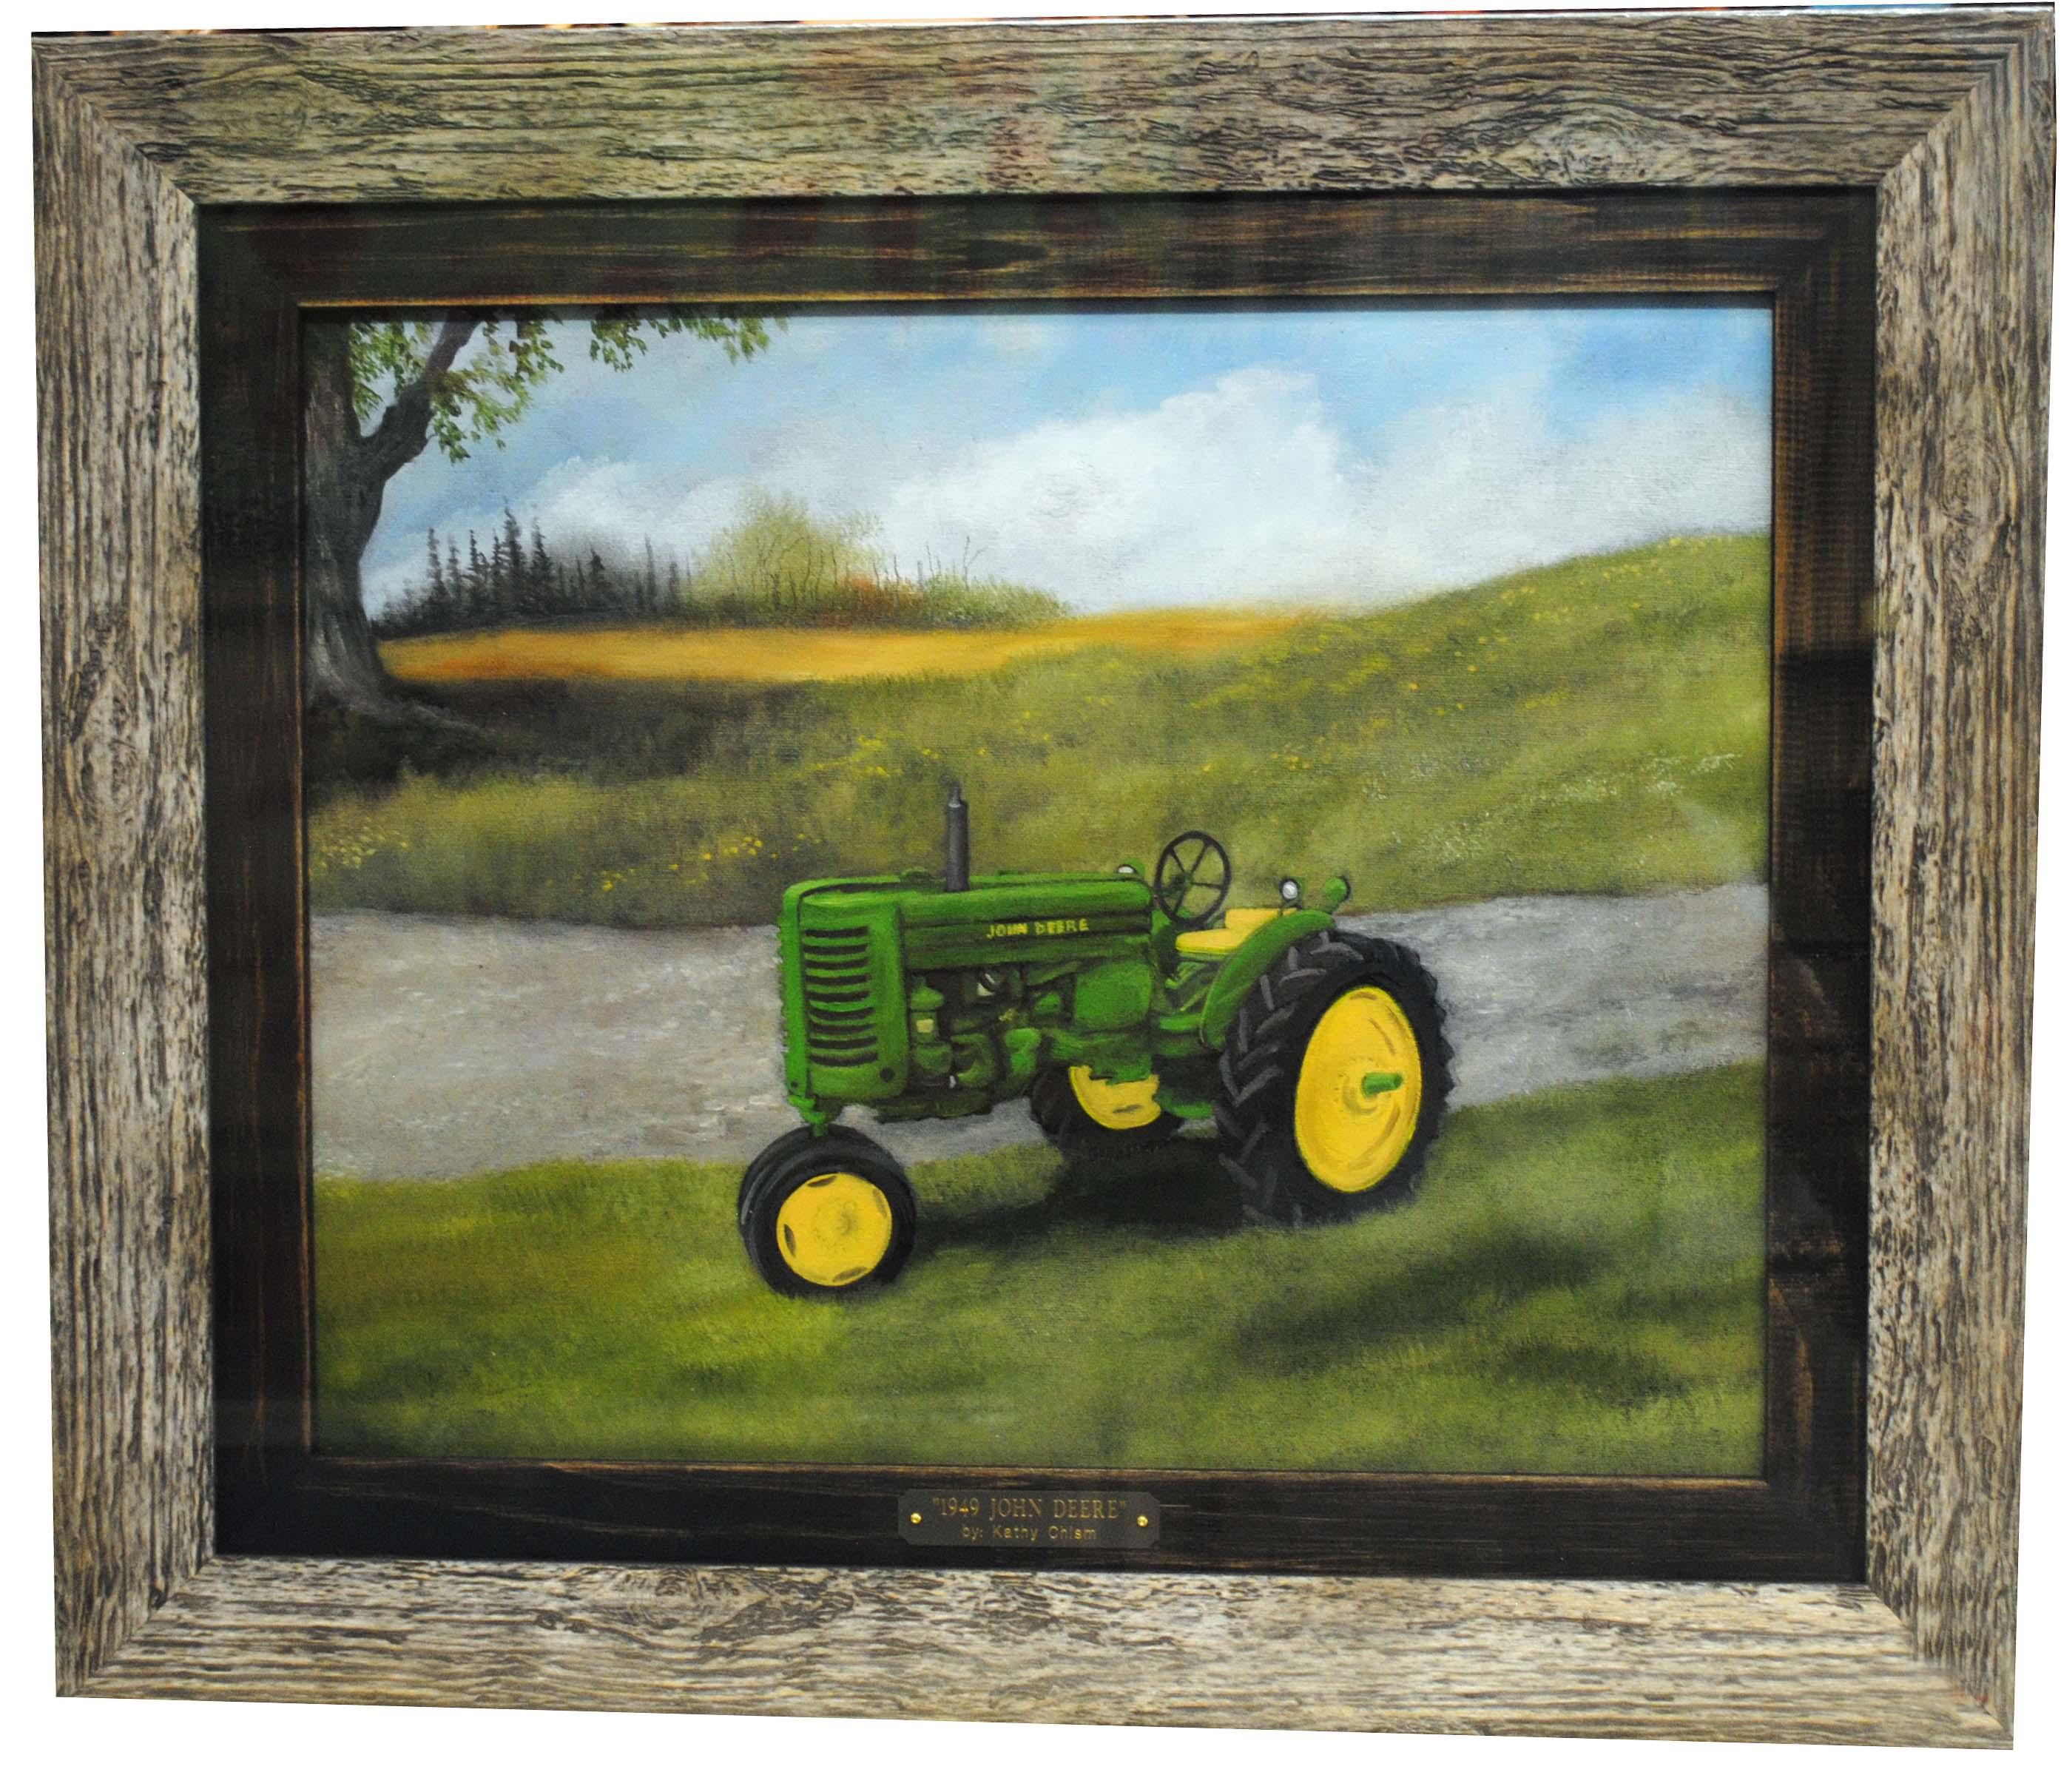 Kathy chism owensboro ky studio 105 art frame title john deere size 16 x 20 price 485 item kc016or medium oil jeuxipadfo Images